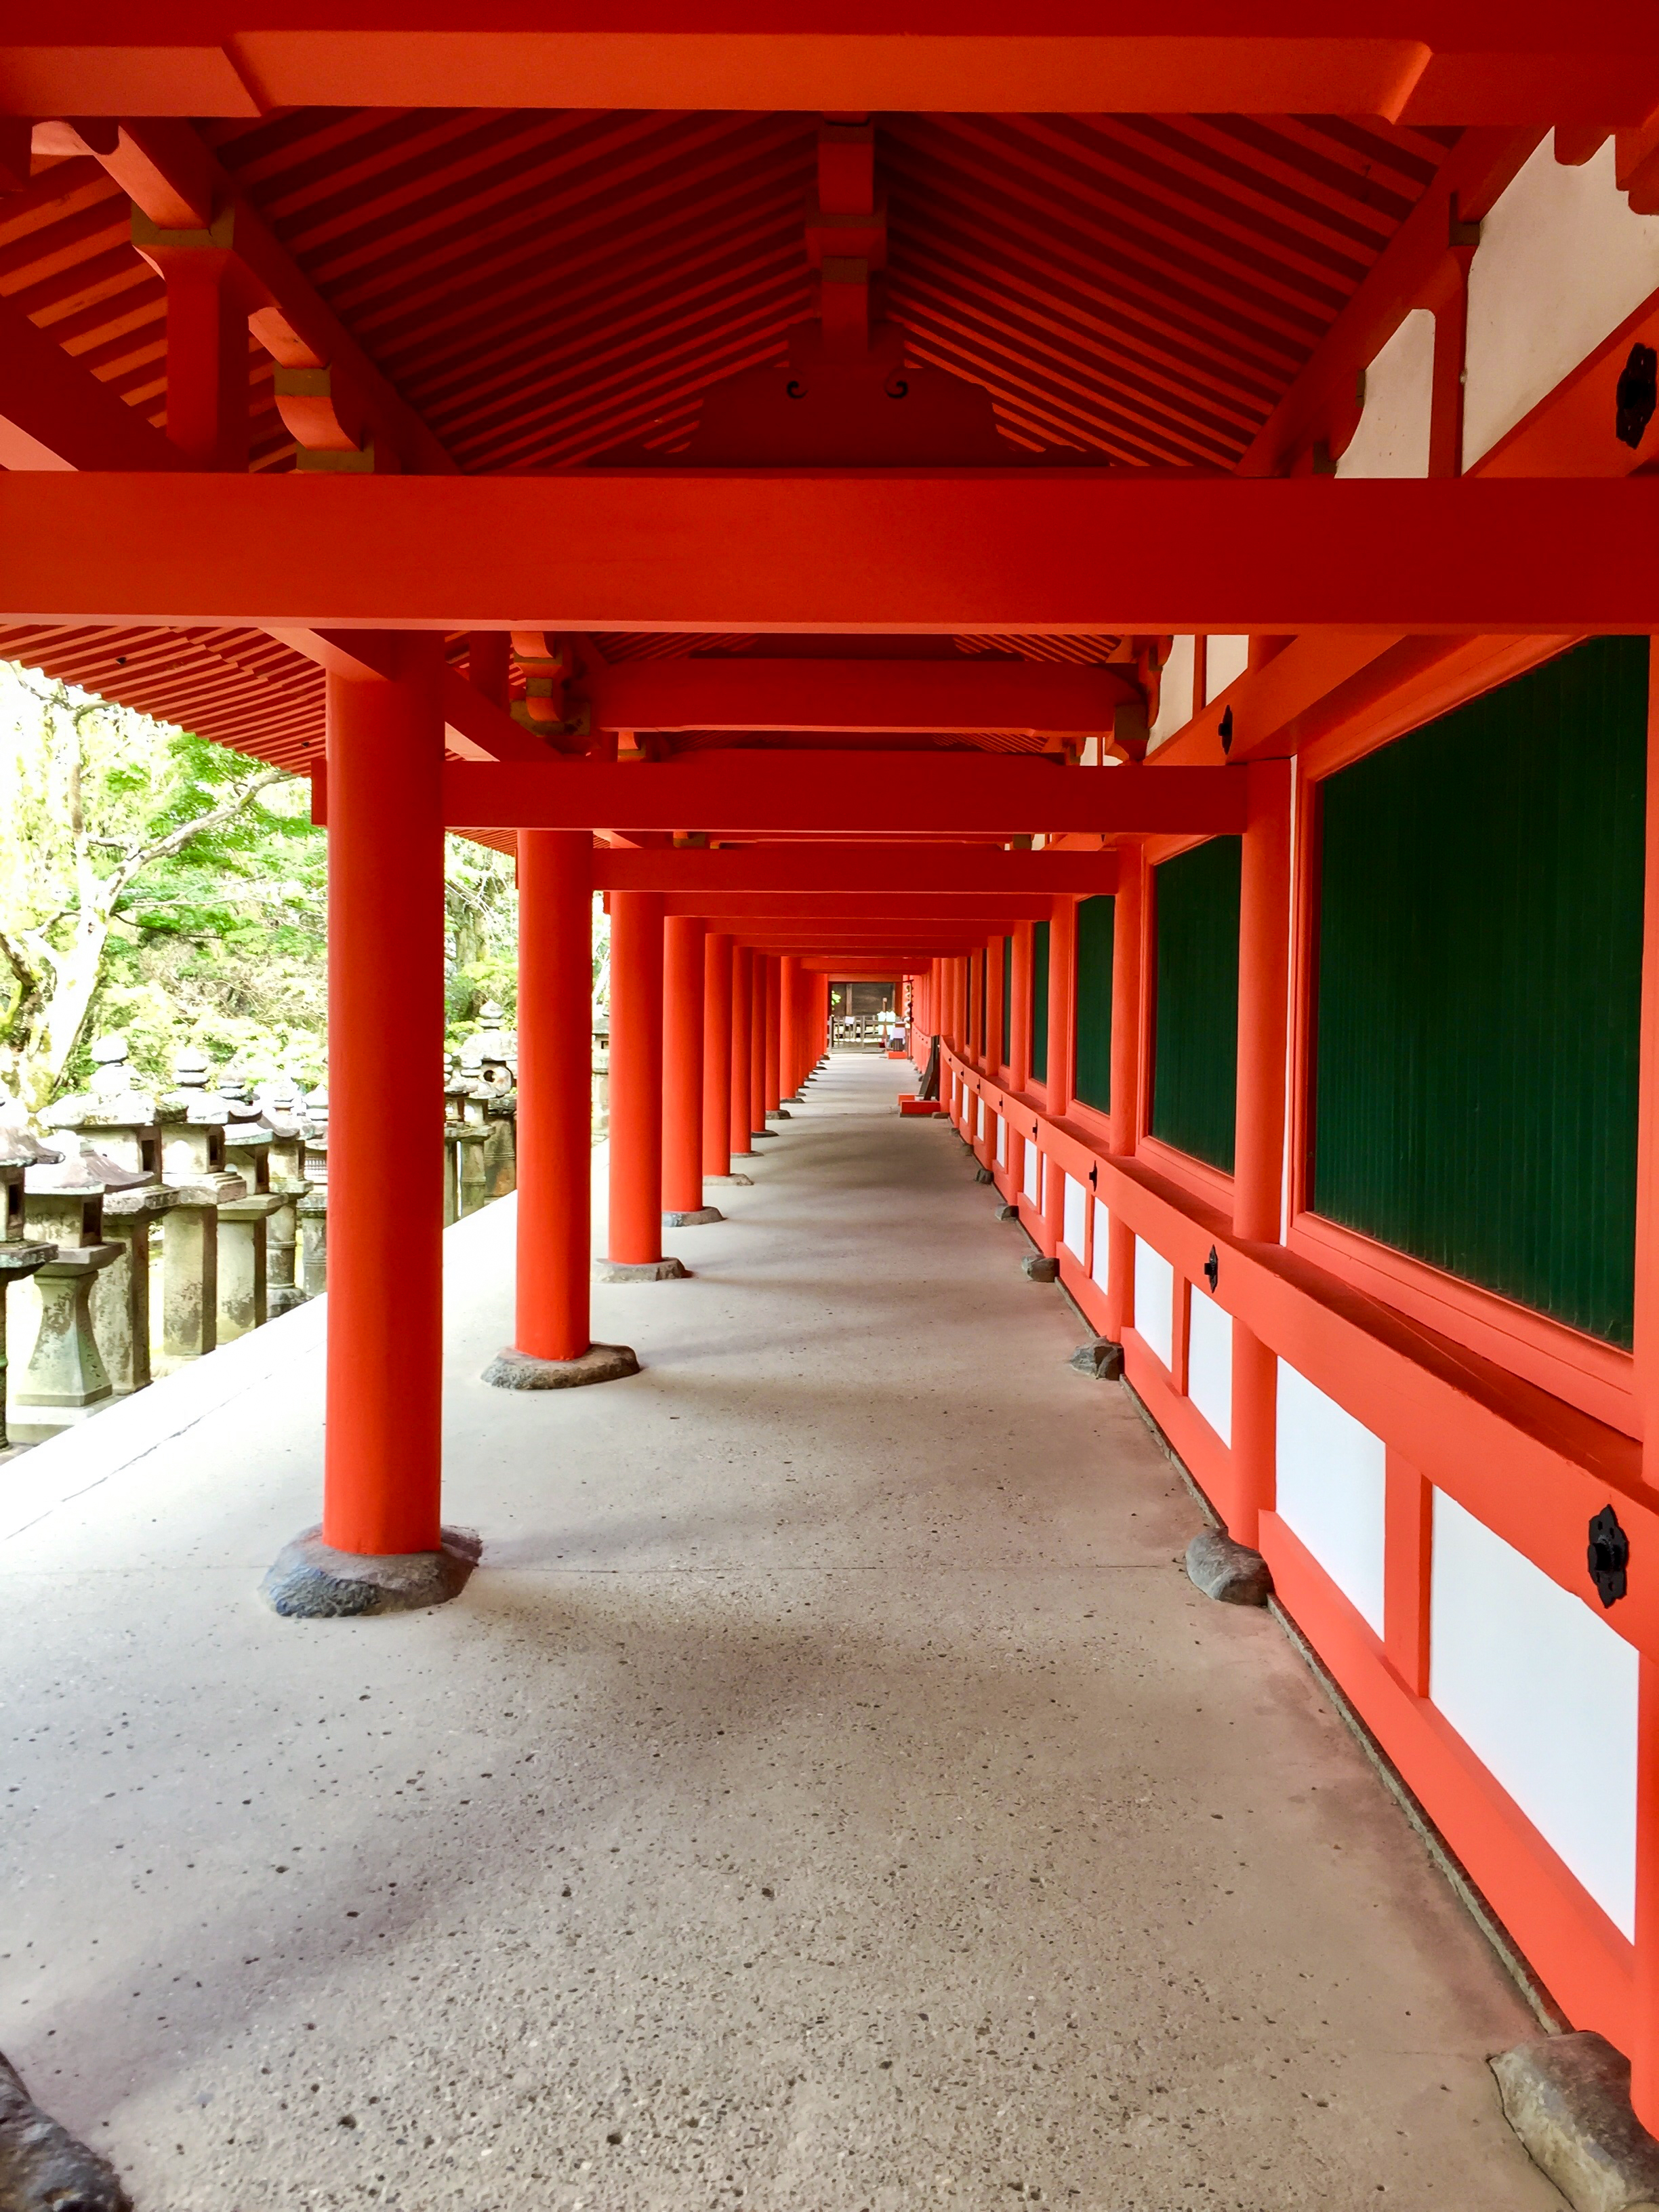 Nara, Japan, Asia | www.DoLessGetMoreDone.com |